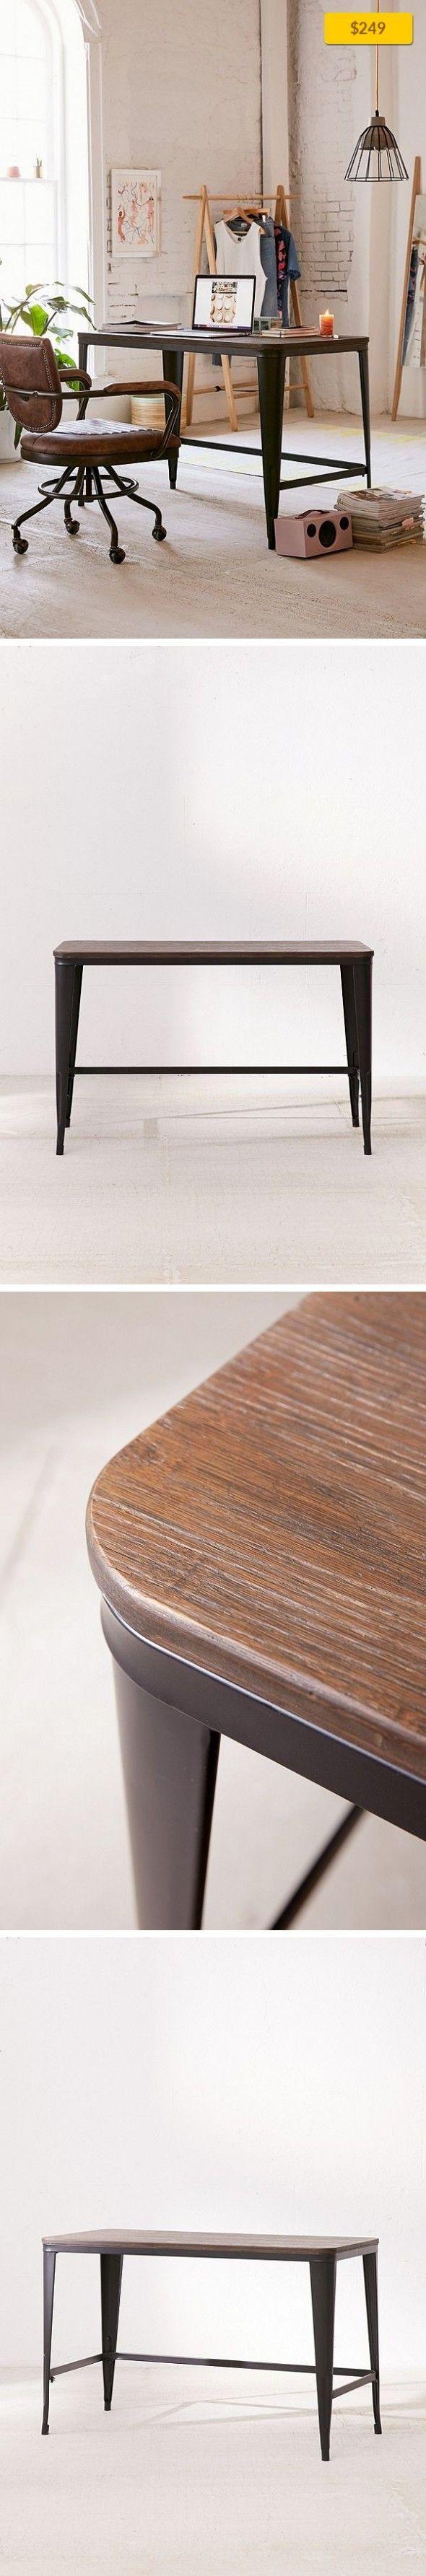 Luxury Wood and Metal Bar Stools